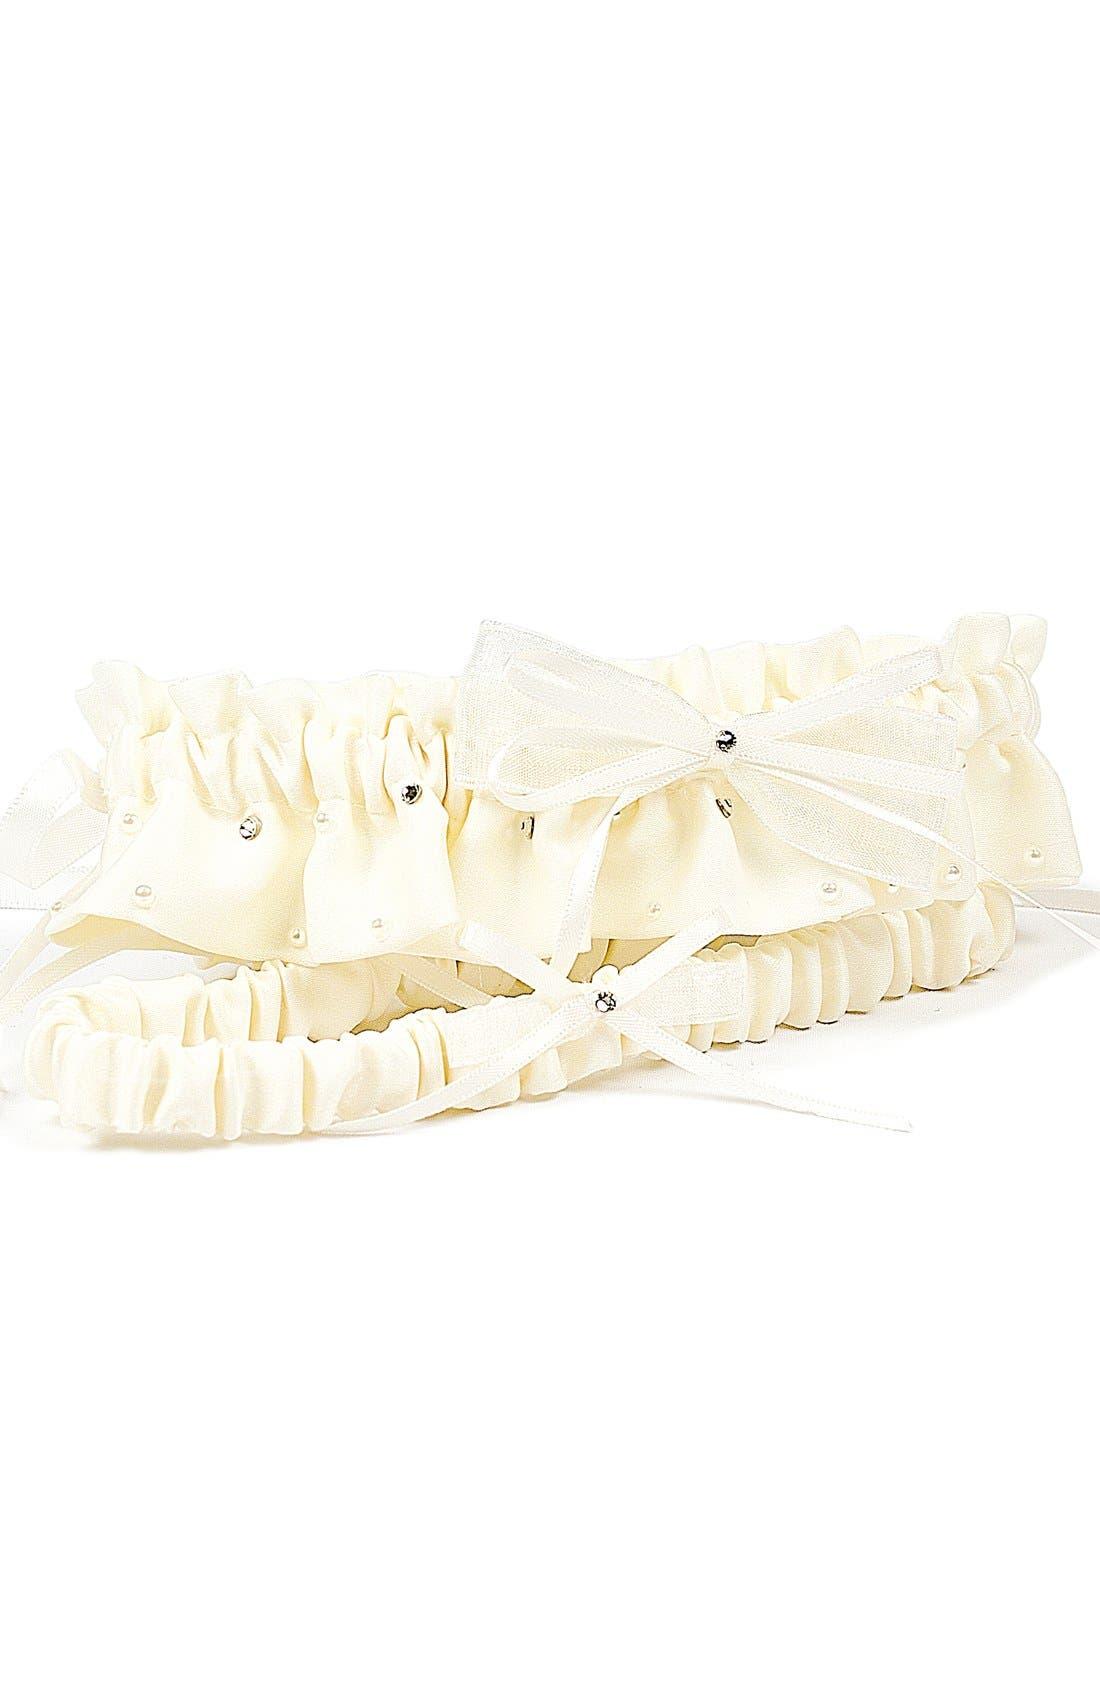 Main Image - Cathy's Concepts 'Candlelight' Adjustable Wedding Garter